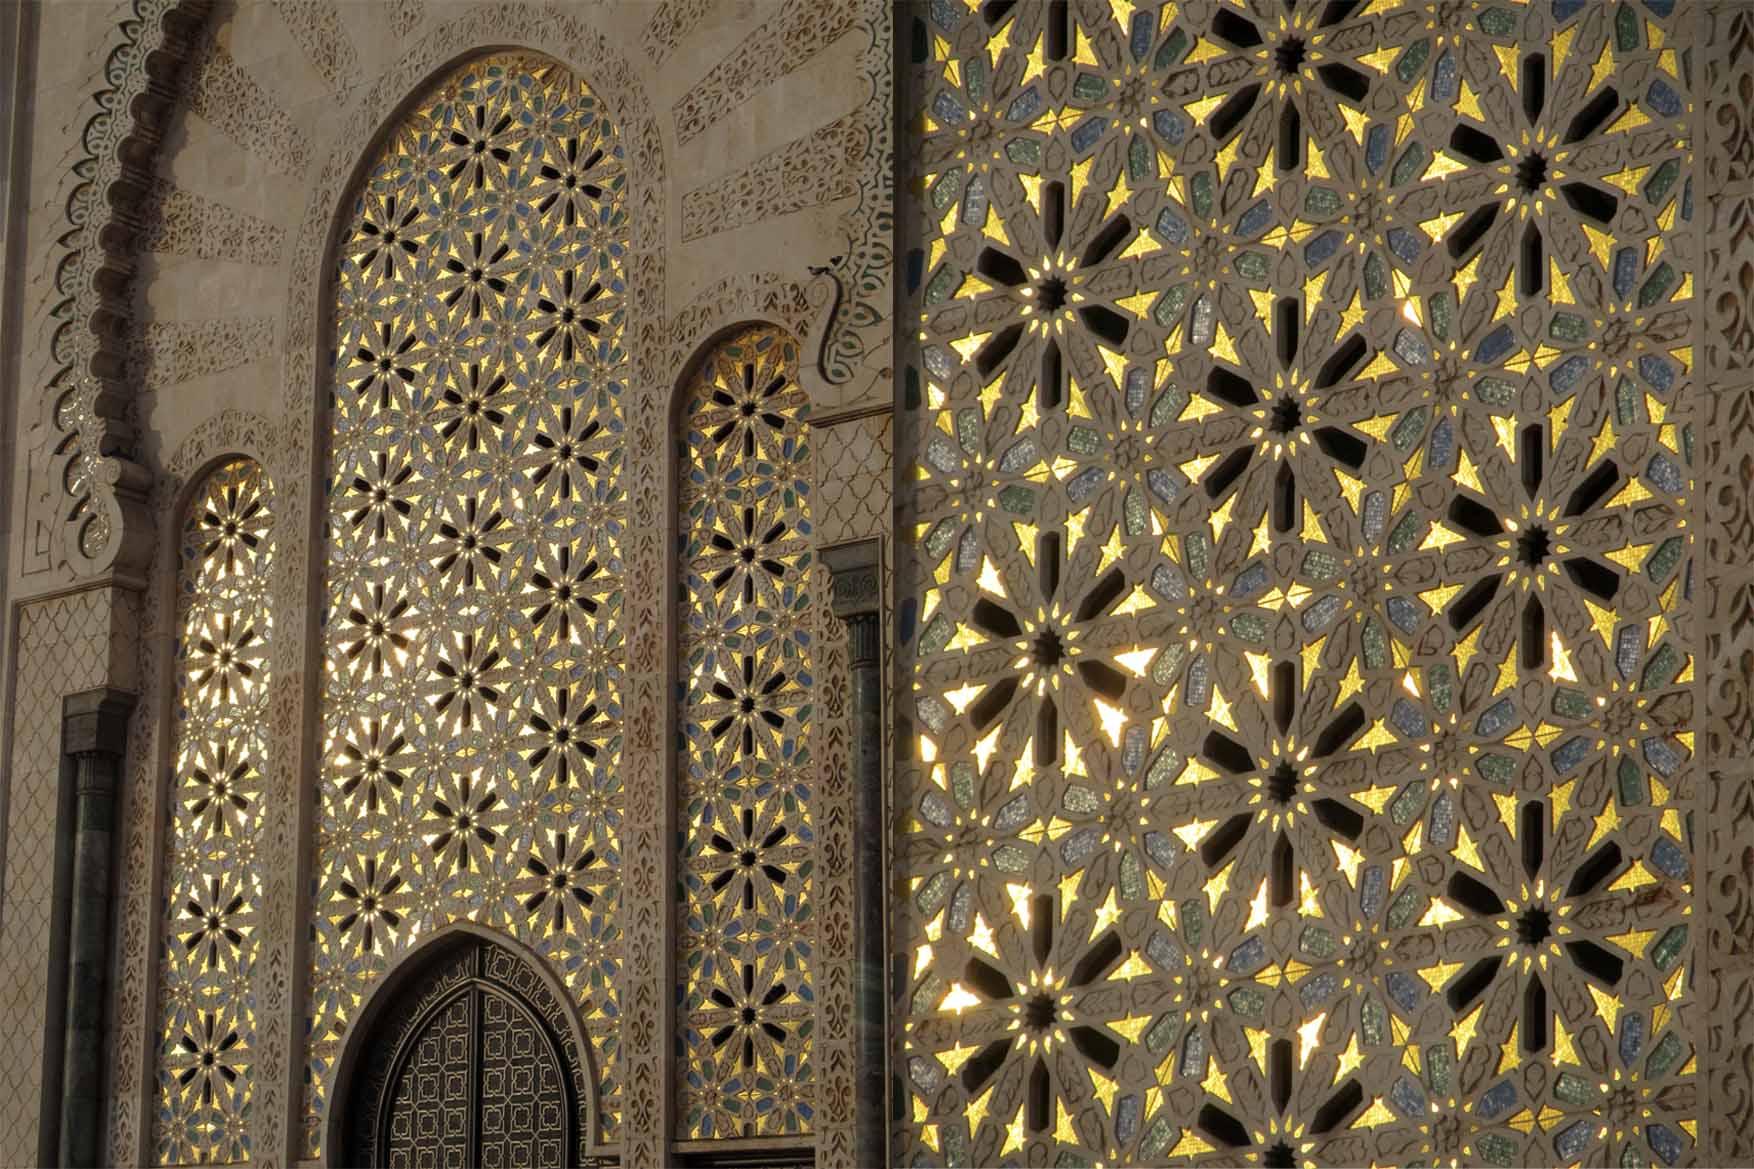 88 maroko kazablanka velika dzamija detalji